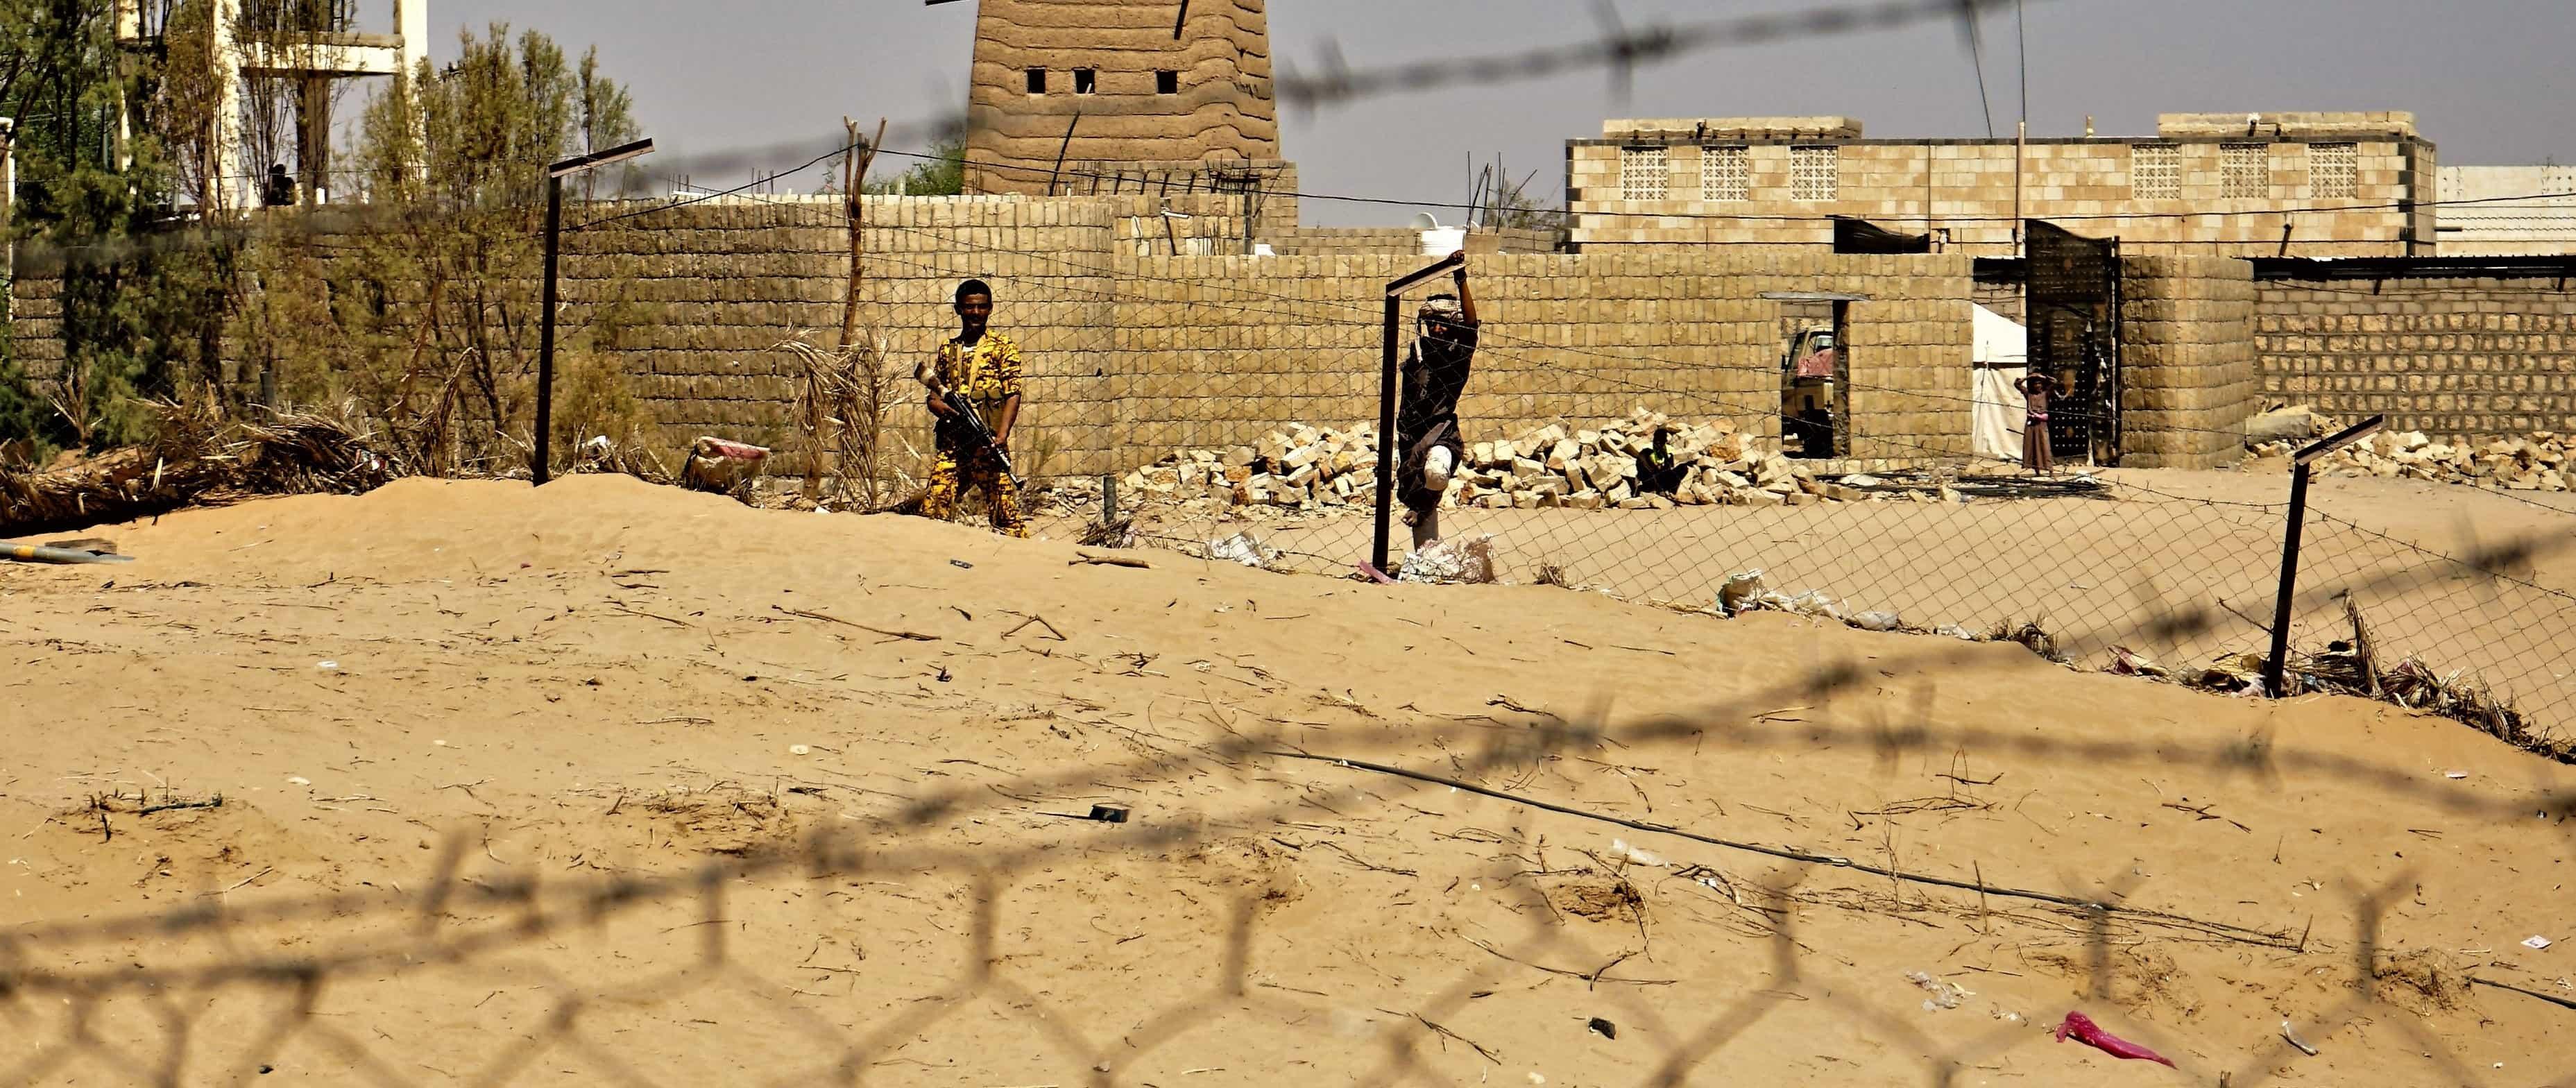 Photos: Alexander Harper, Sanaa Centre for Strategic Studies